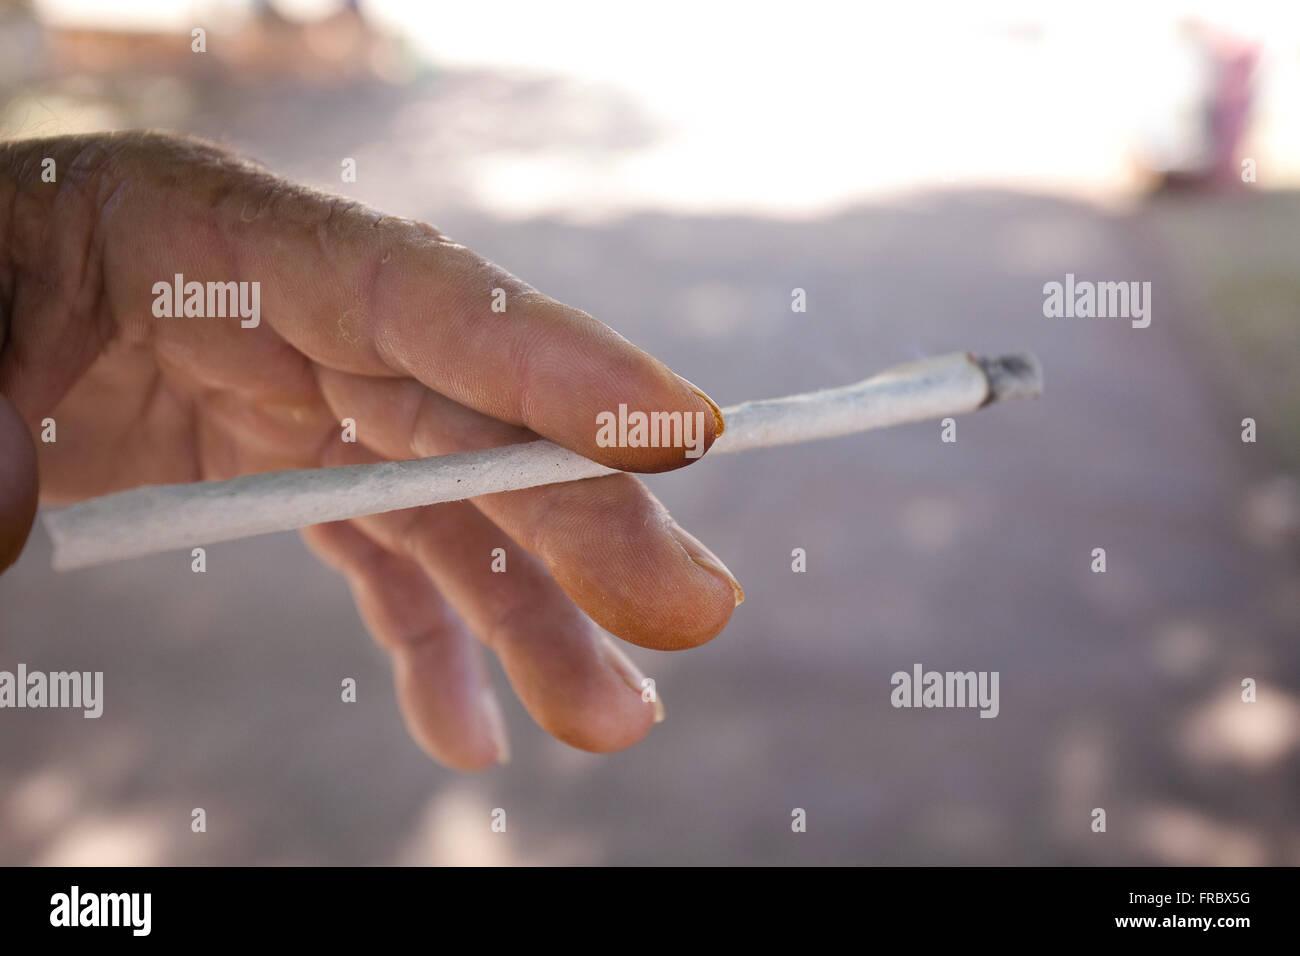 Elderly crafted cigarette smoking - Stock Image